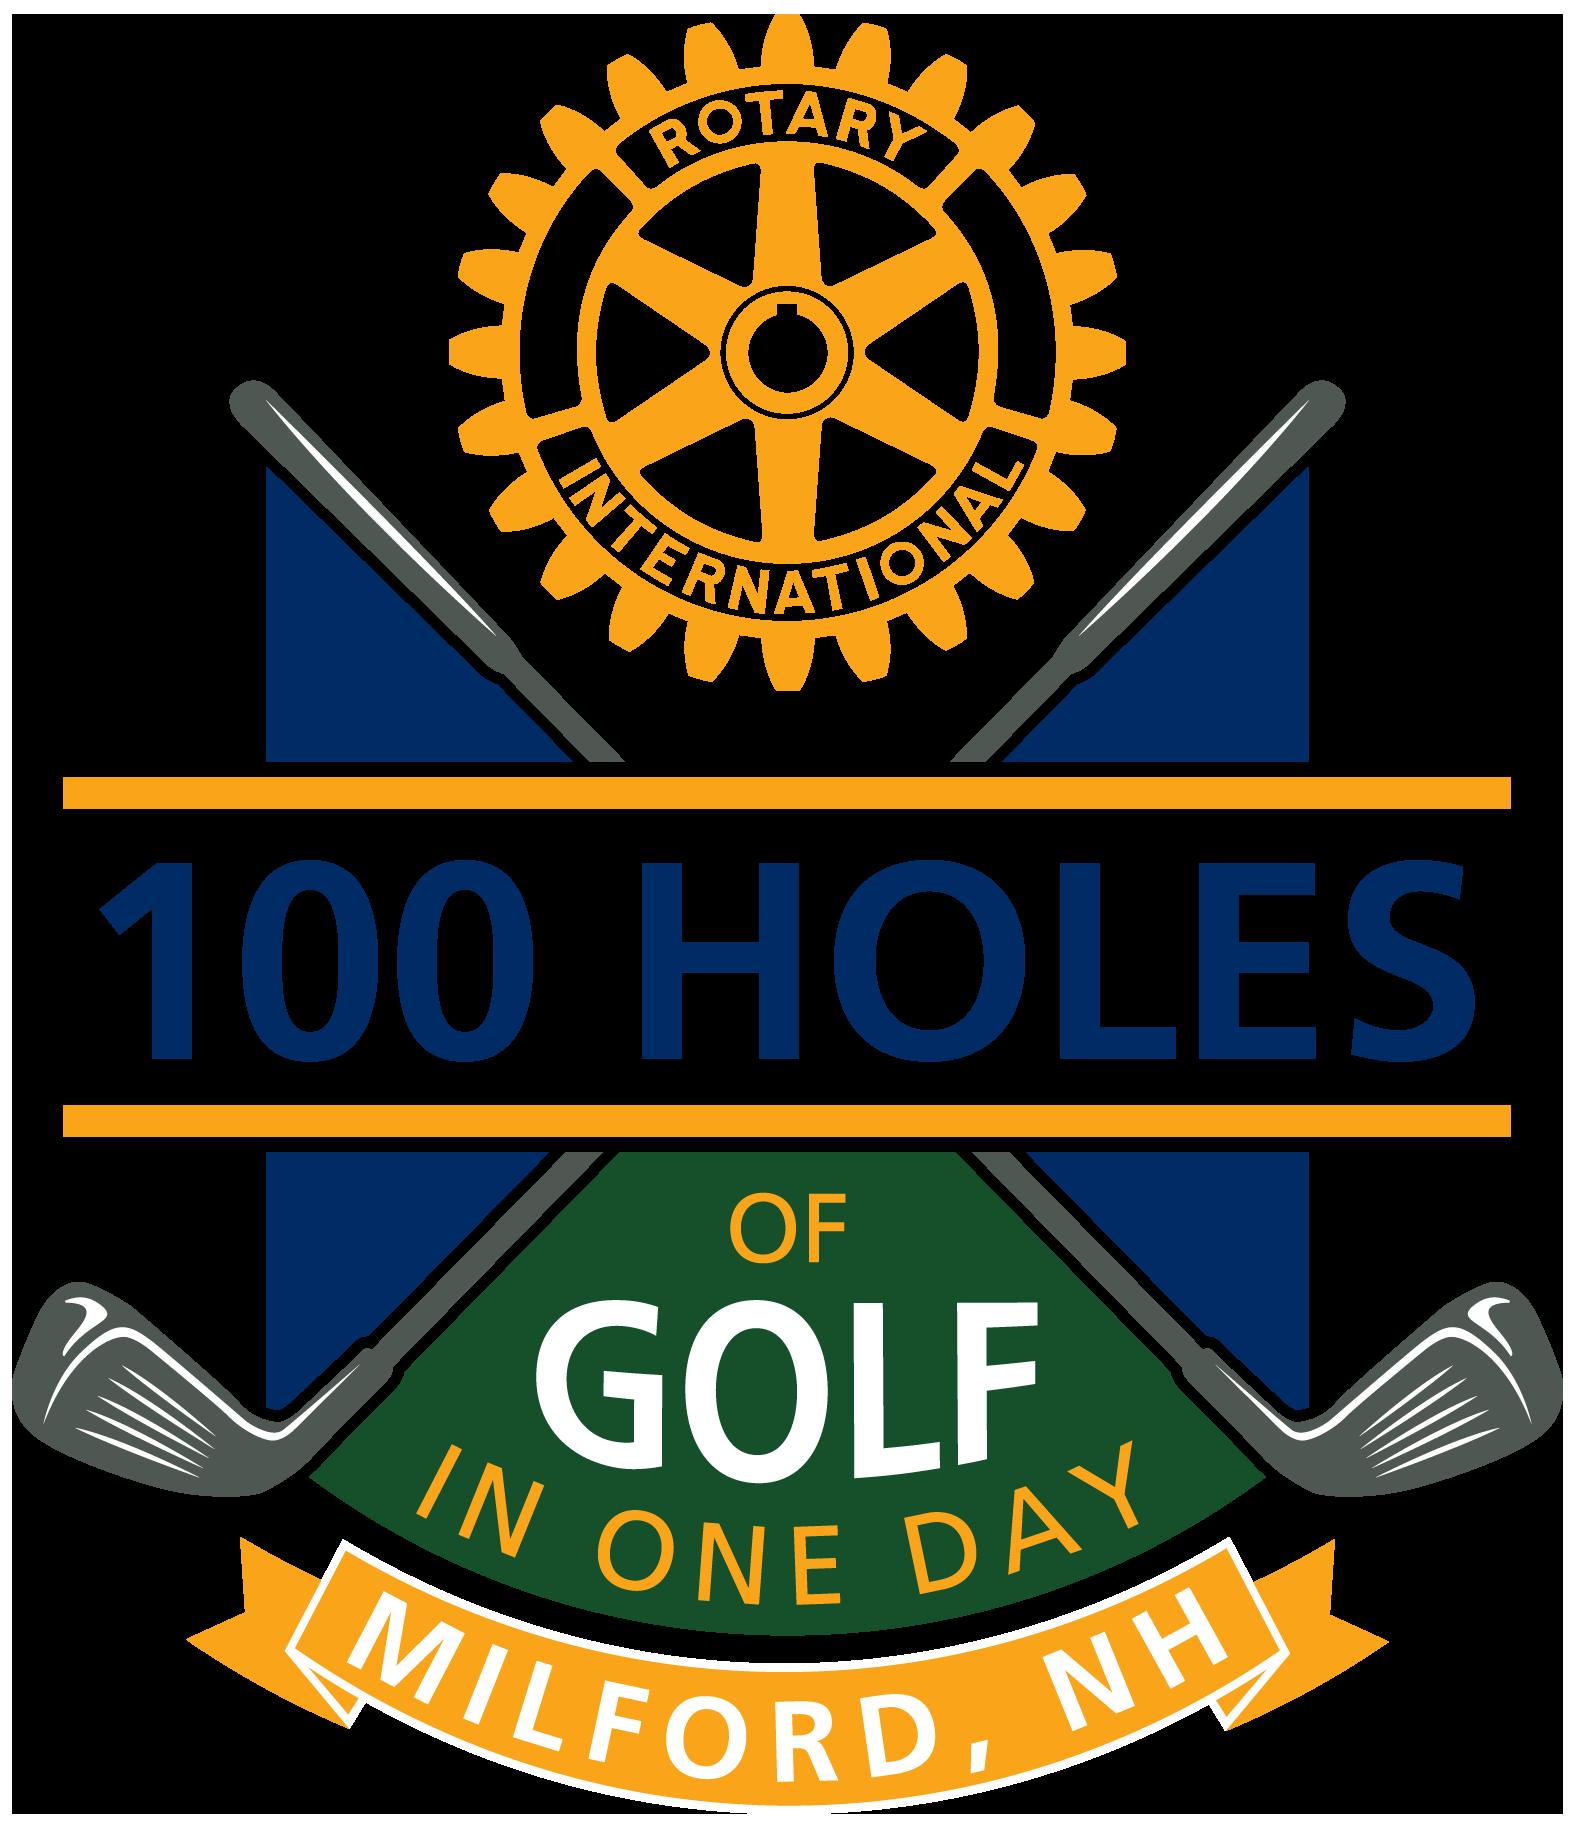 100 Holes of Golf